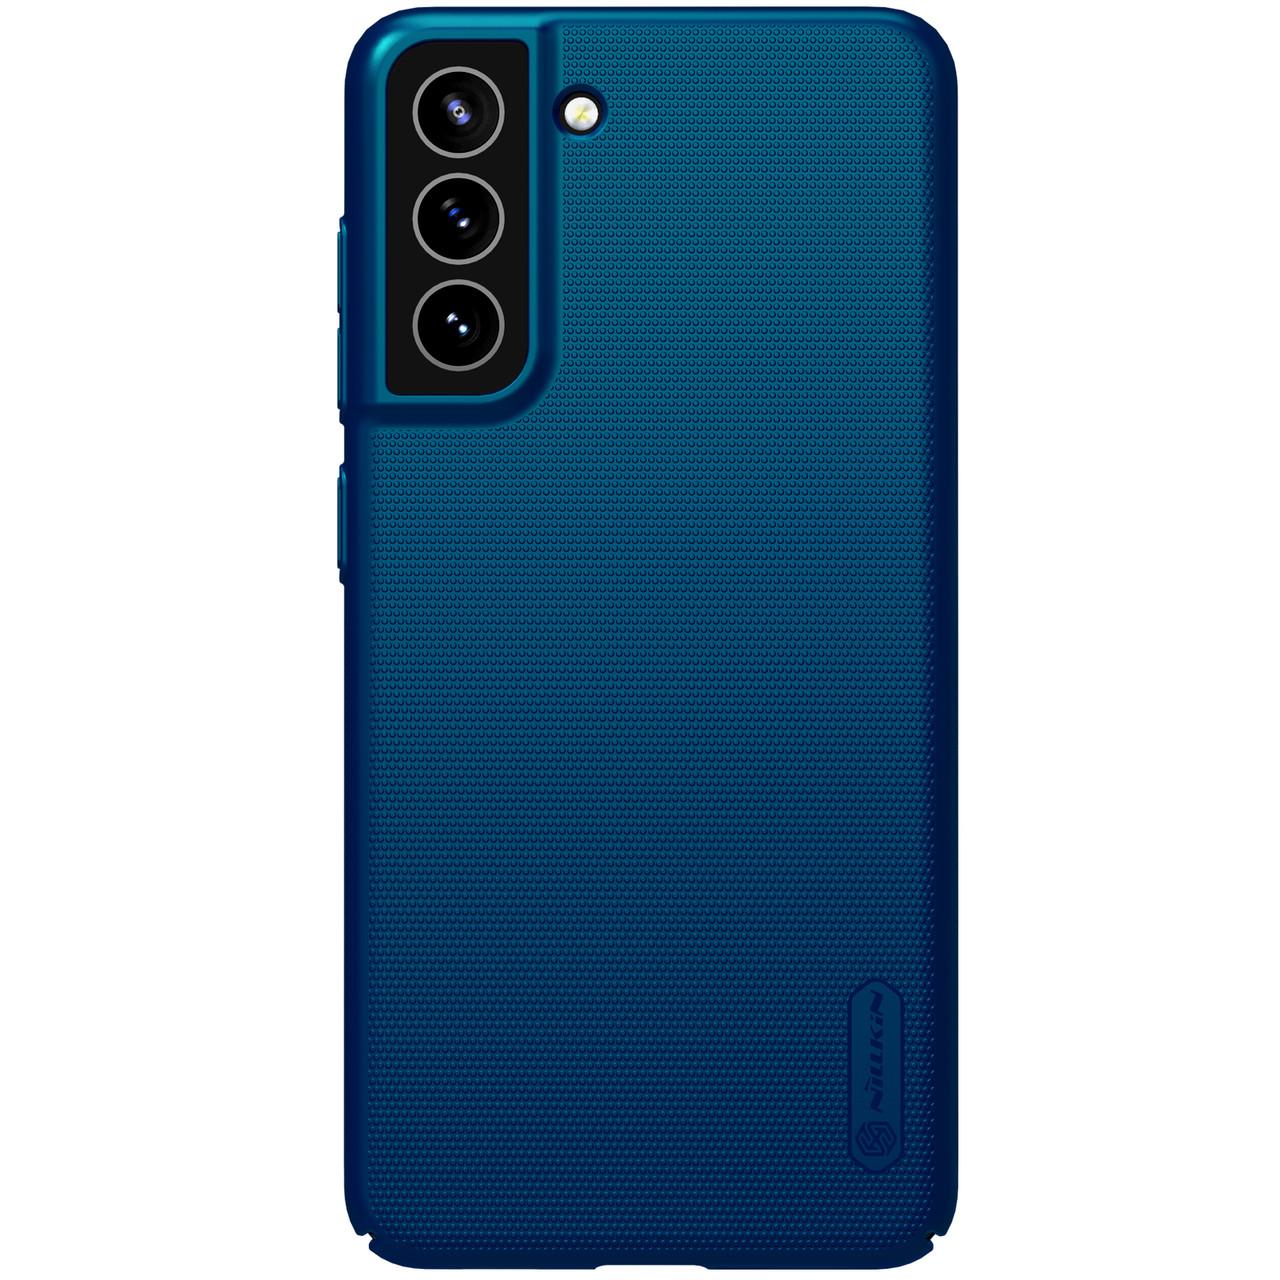 Захисний чохол Nillkin для Samsung Galaxy S21 FE 2021 Super Frosted Shield Blue Синій